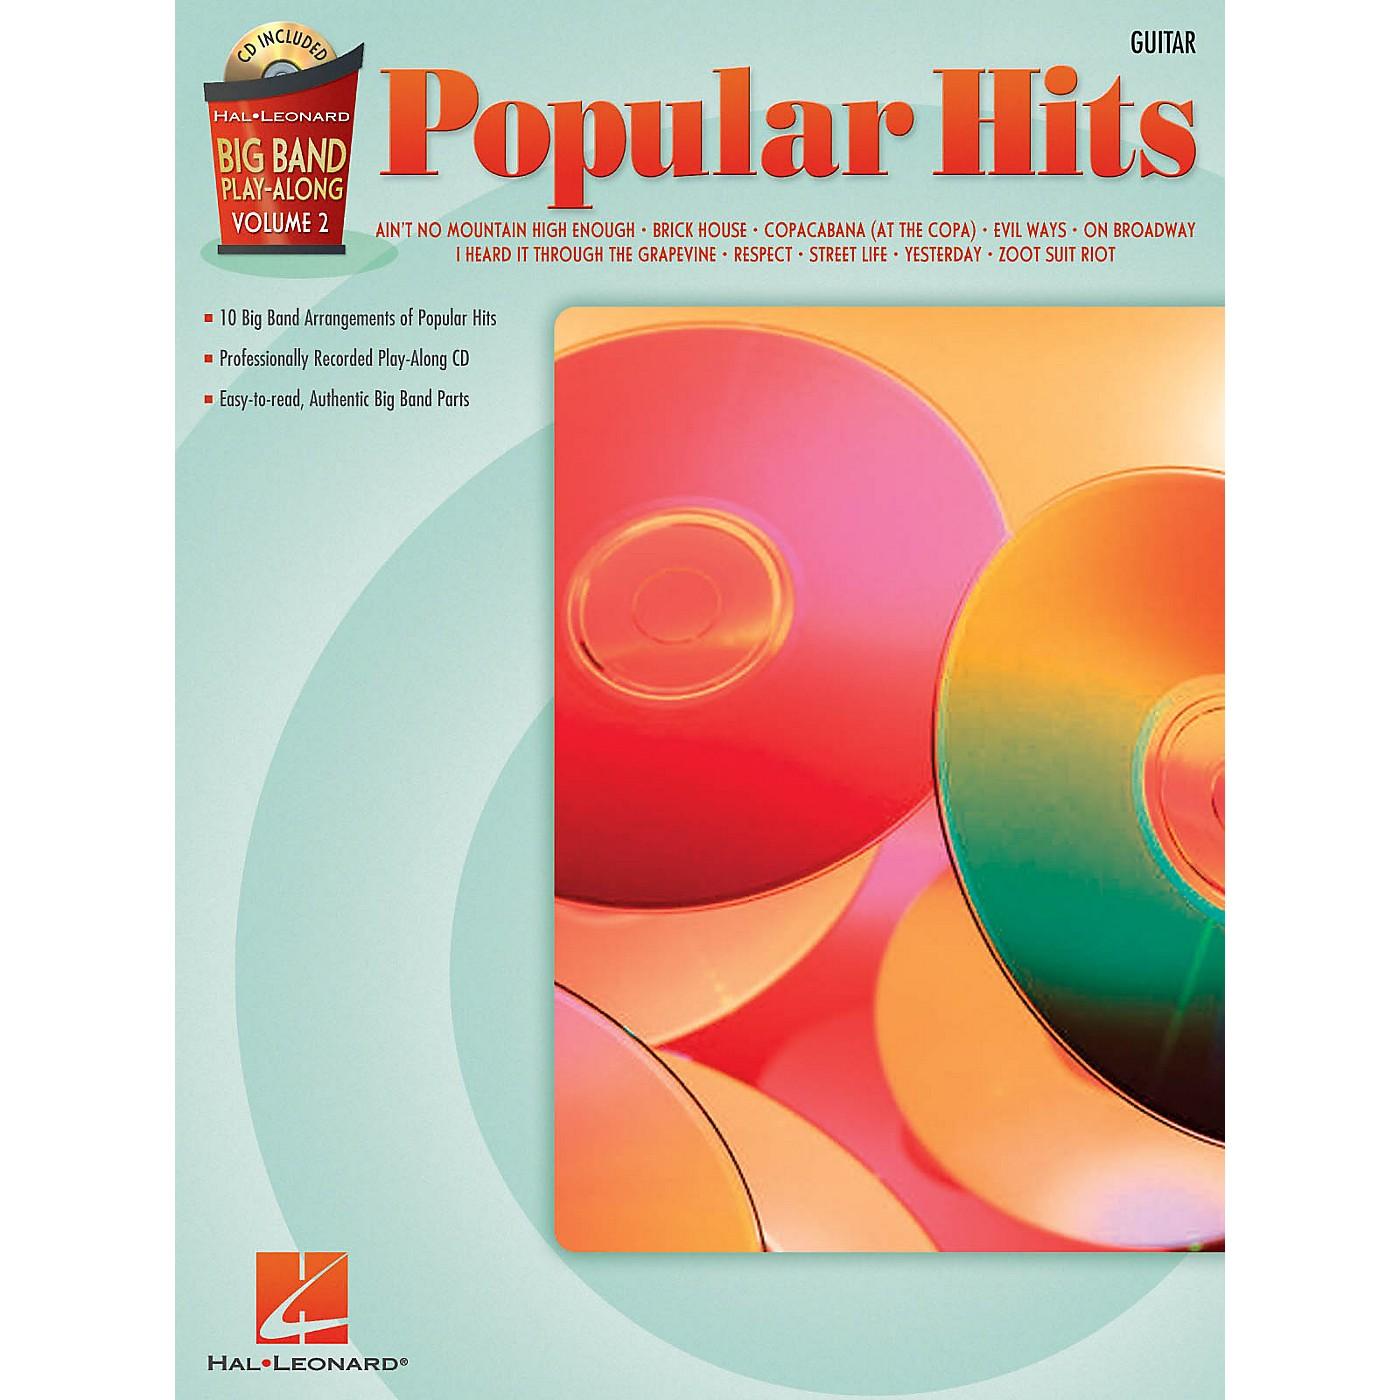 Hal Leonard Popular Hits - Guitar (Big Band Play-Along Volume 2) Big Band Play-Along Series Softcover with CD thumbnail